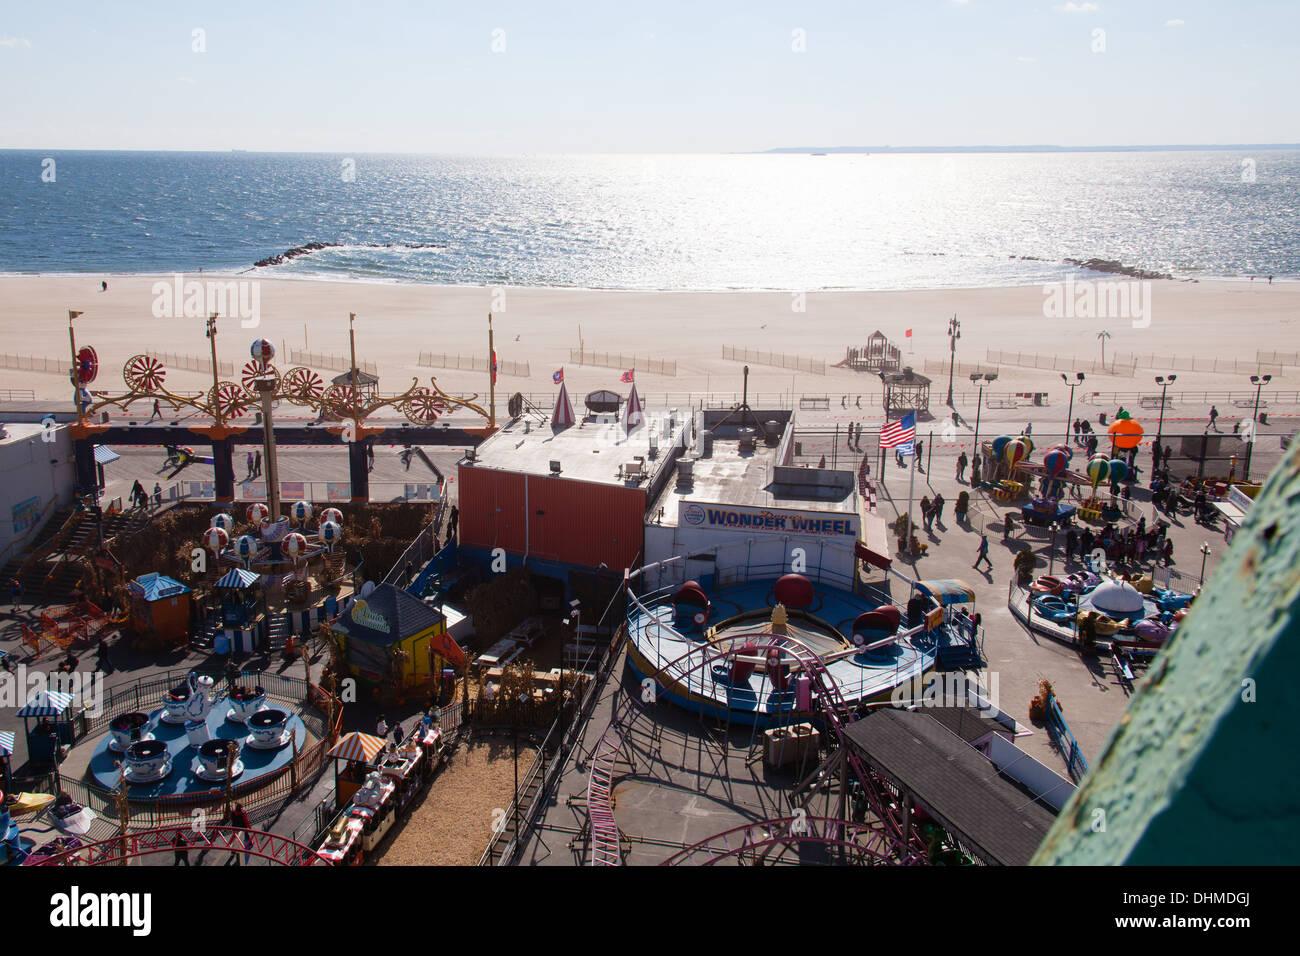 Coney island beach in October, Coney island, Brooklyn, New York, United States of America. - Stock Image